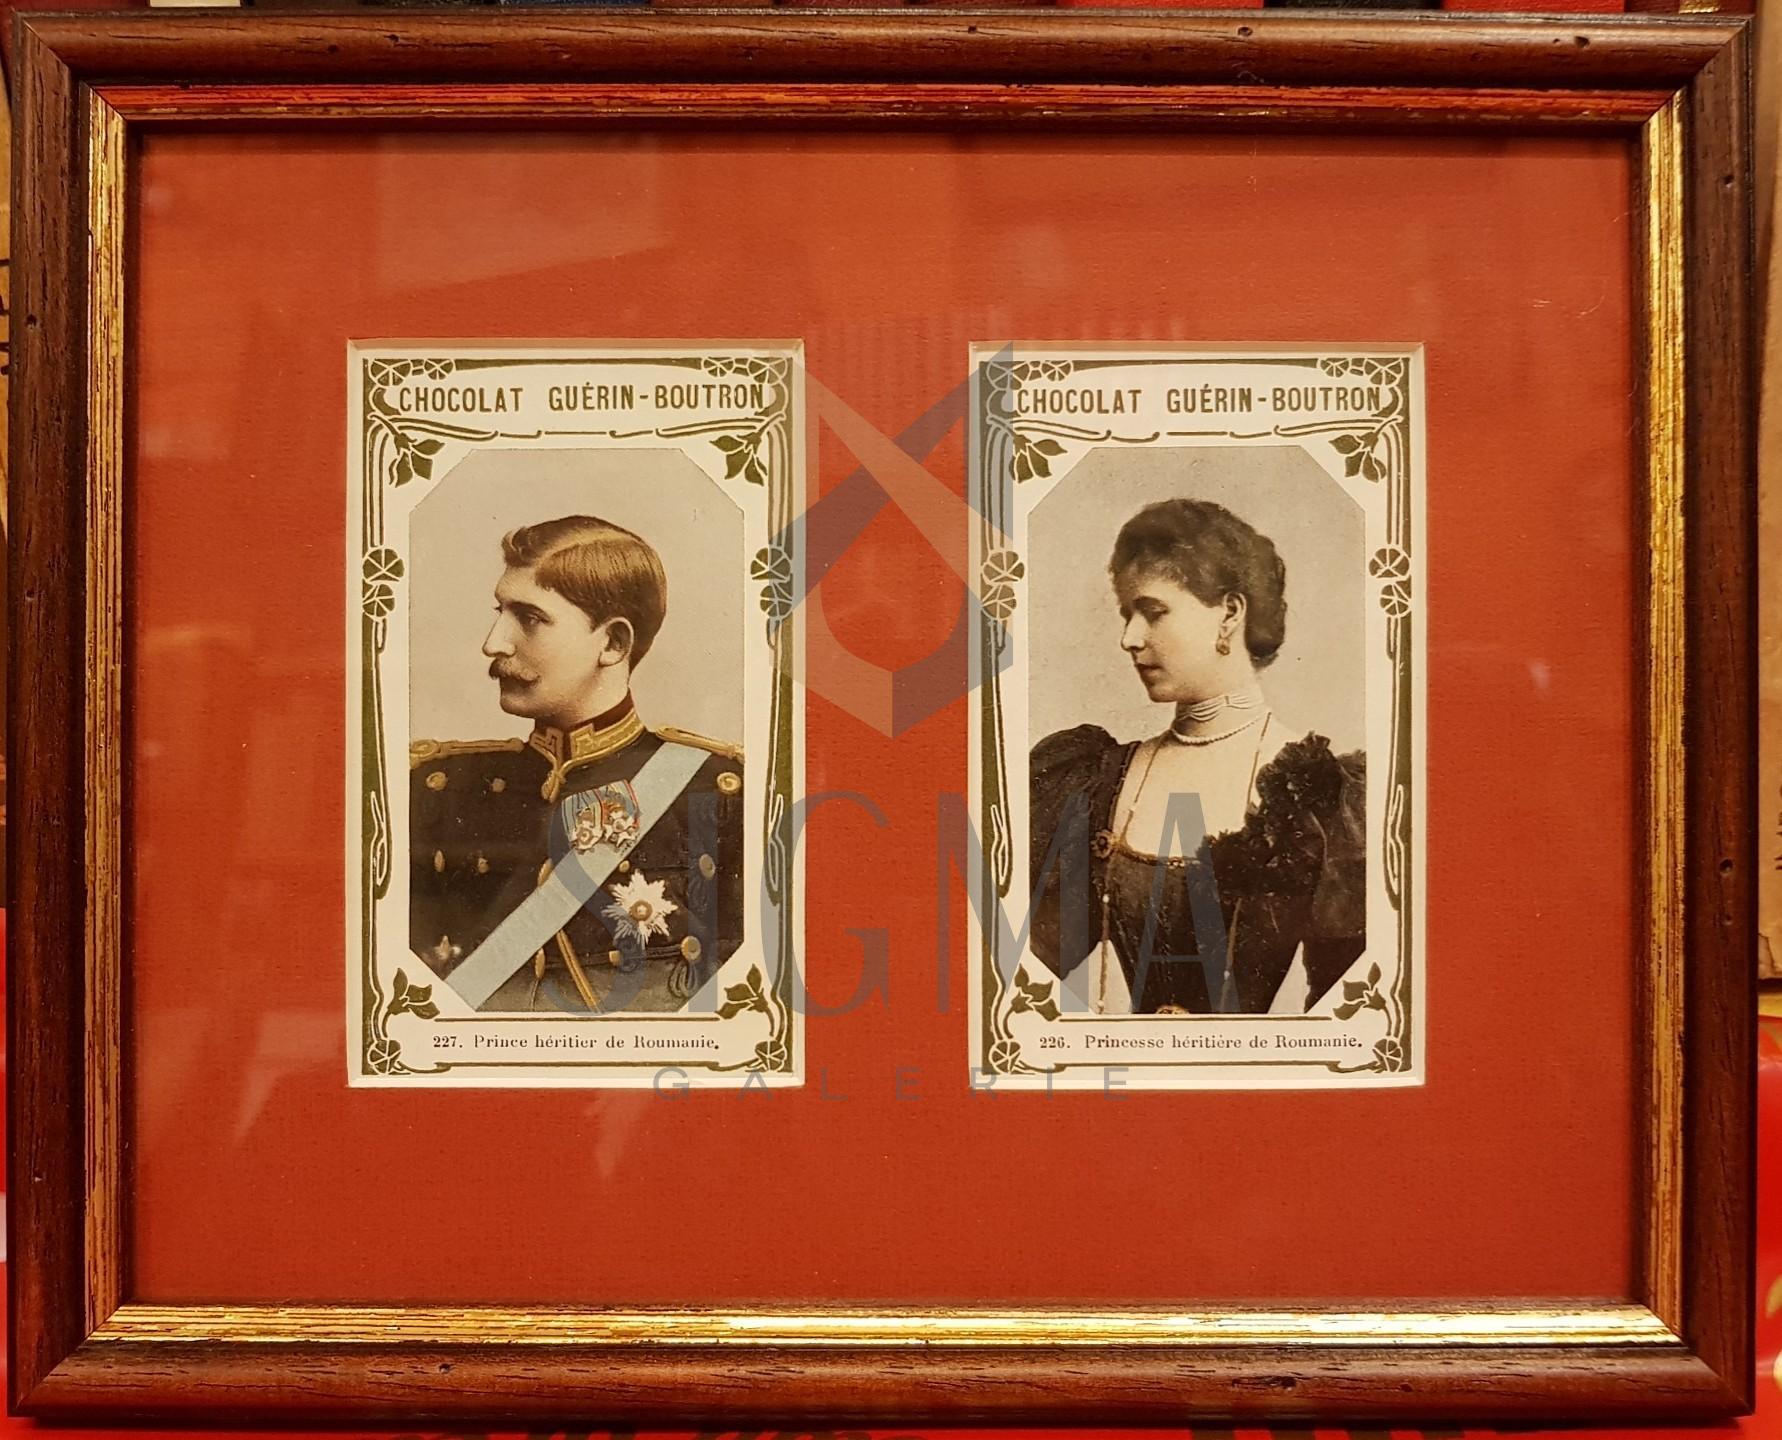 "REGELE FERDINAND SI REGINA MARIA, 2 CROMOLITOGRAFII, RECLAME LA "" CHOCOLAT GUERIN - BOUTRON"" , 1900"